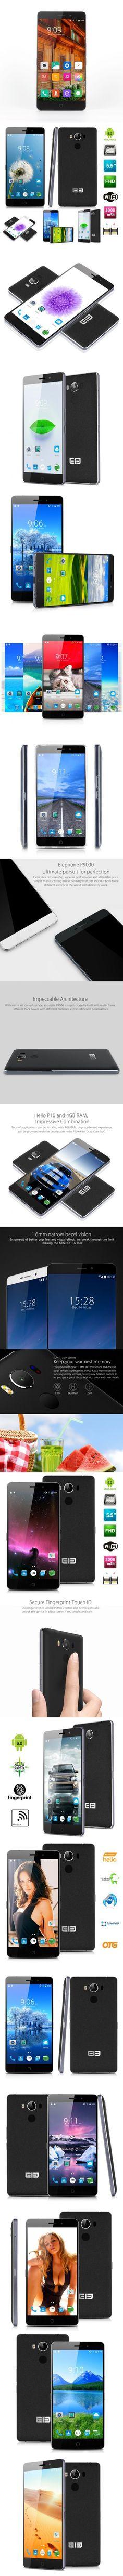 Elephone P9000 4G Android 6.0 Fingerprint Phone EU PLUG-$276.91